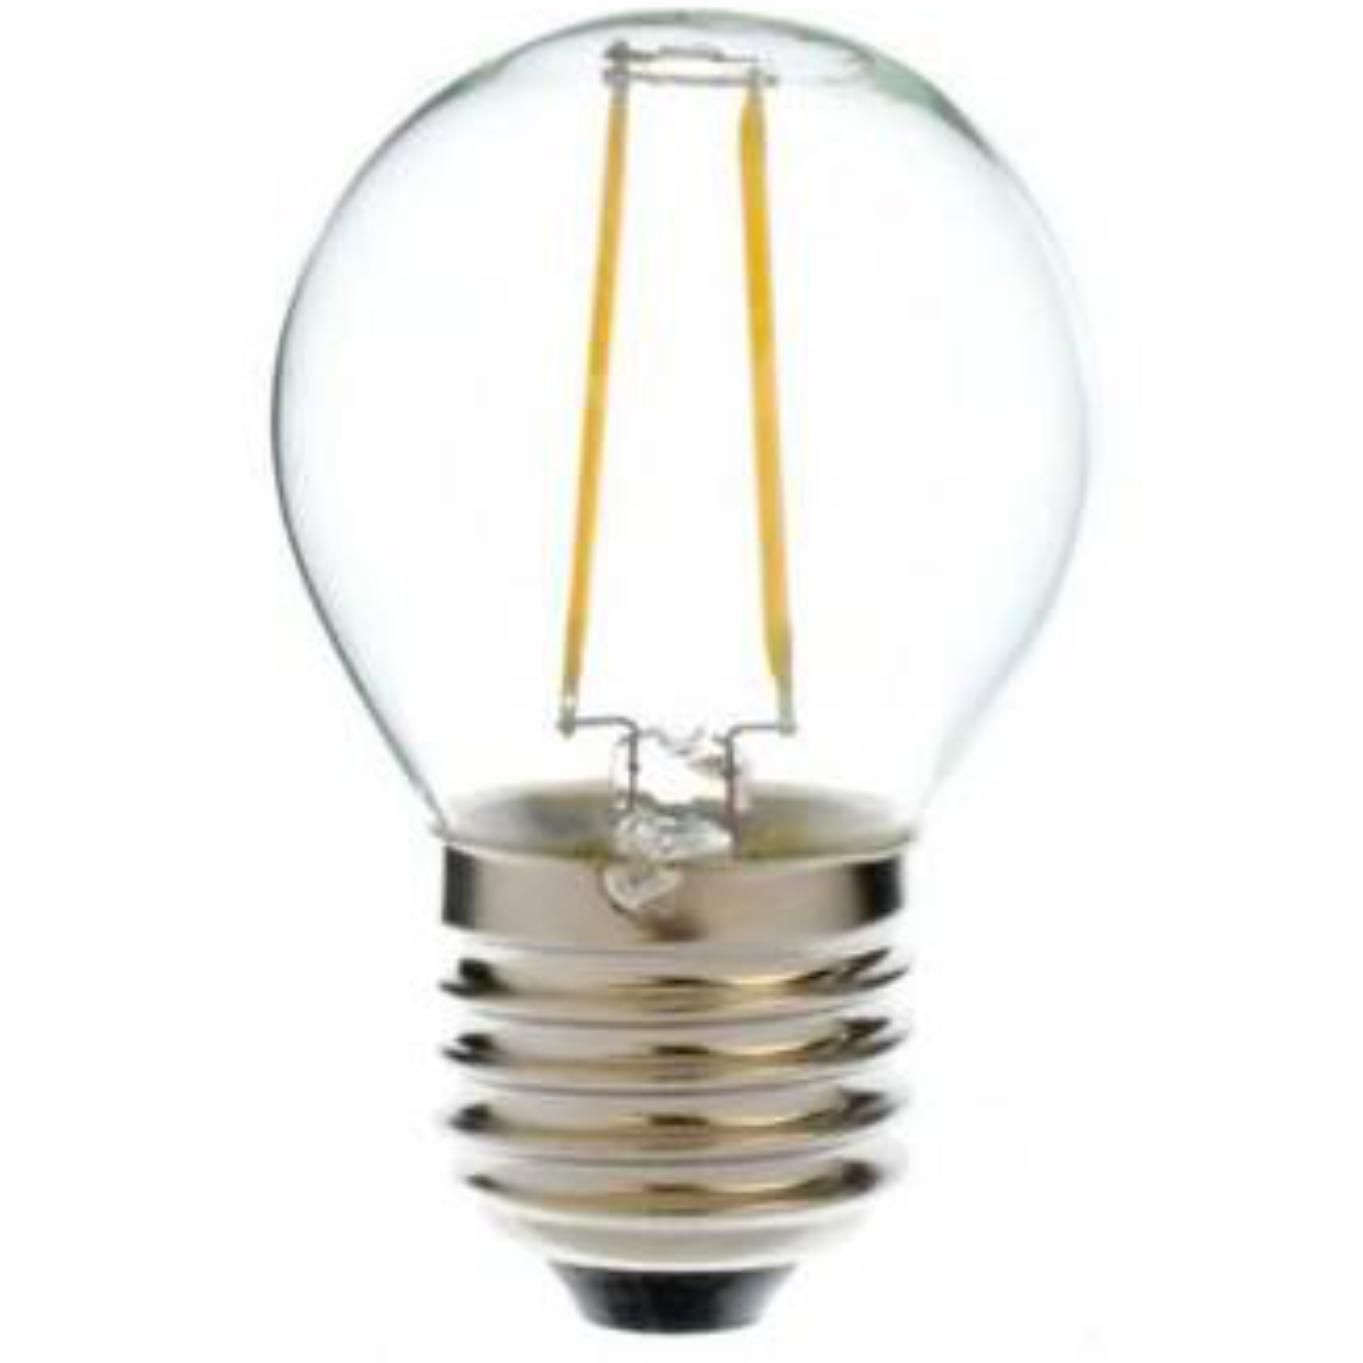 Image of E27 filament lamp - Neutraal wit - Tronix